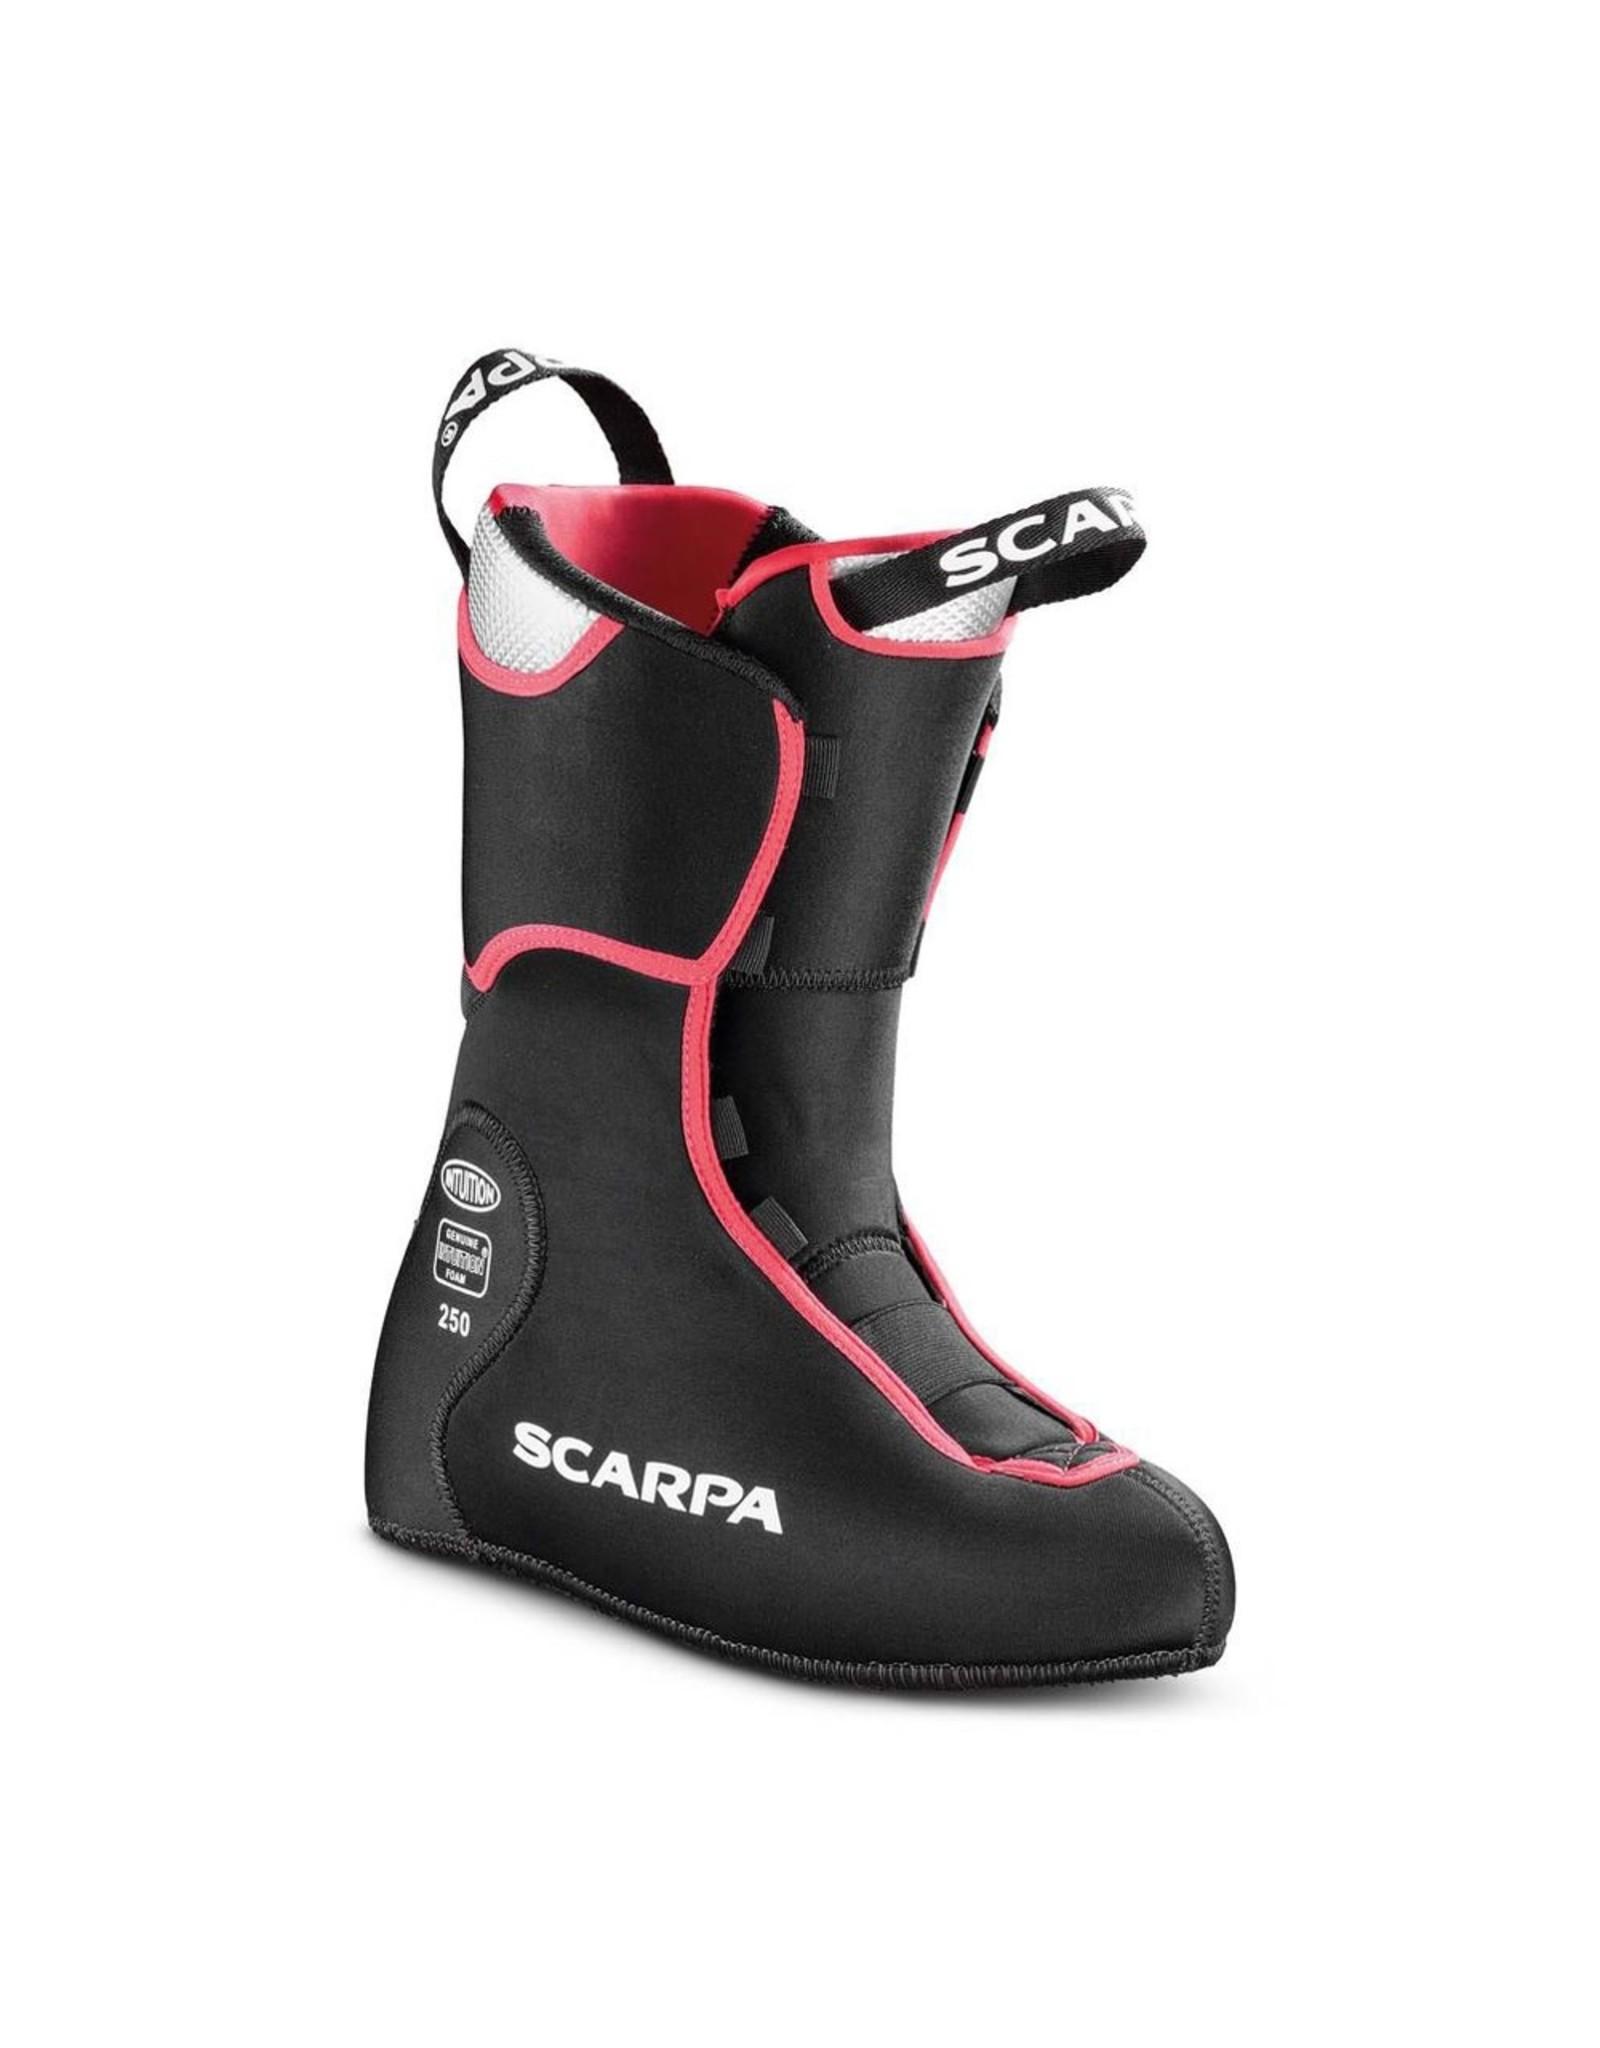 Scarpa Scarpa Gea RS Ski Boots - Women